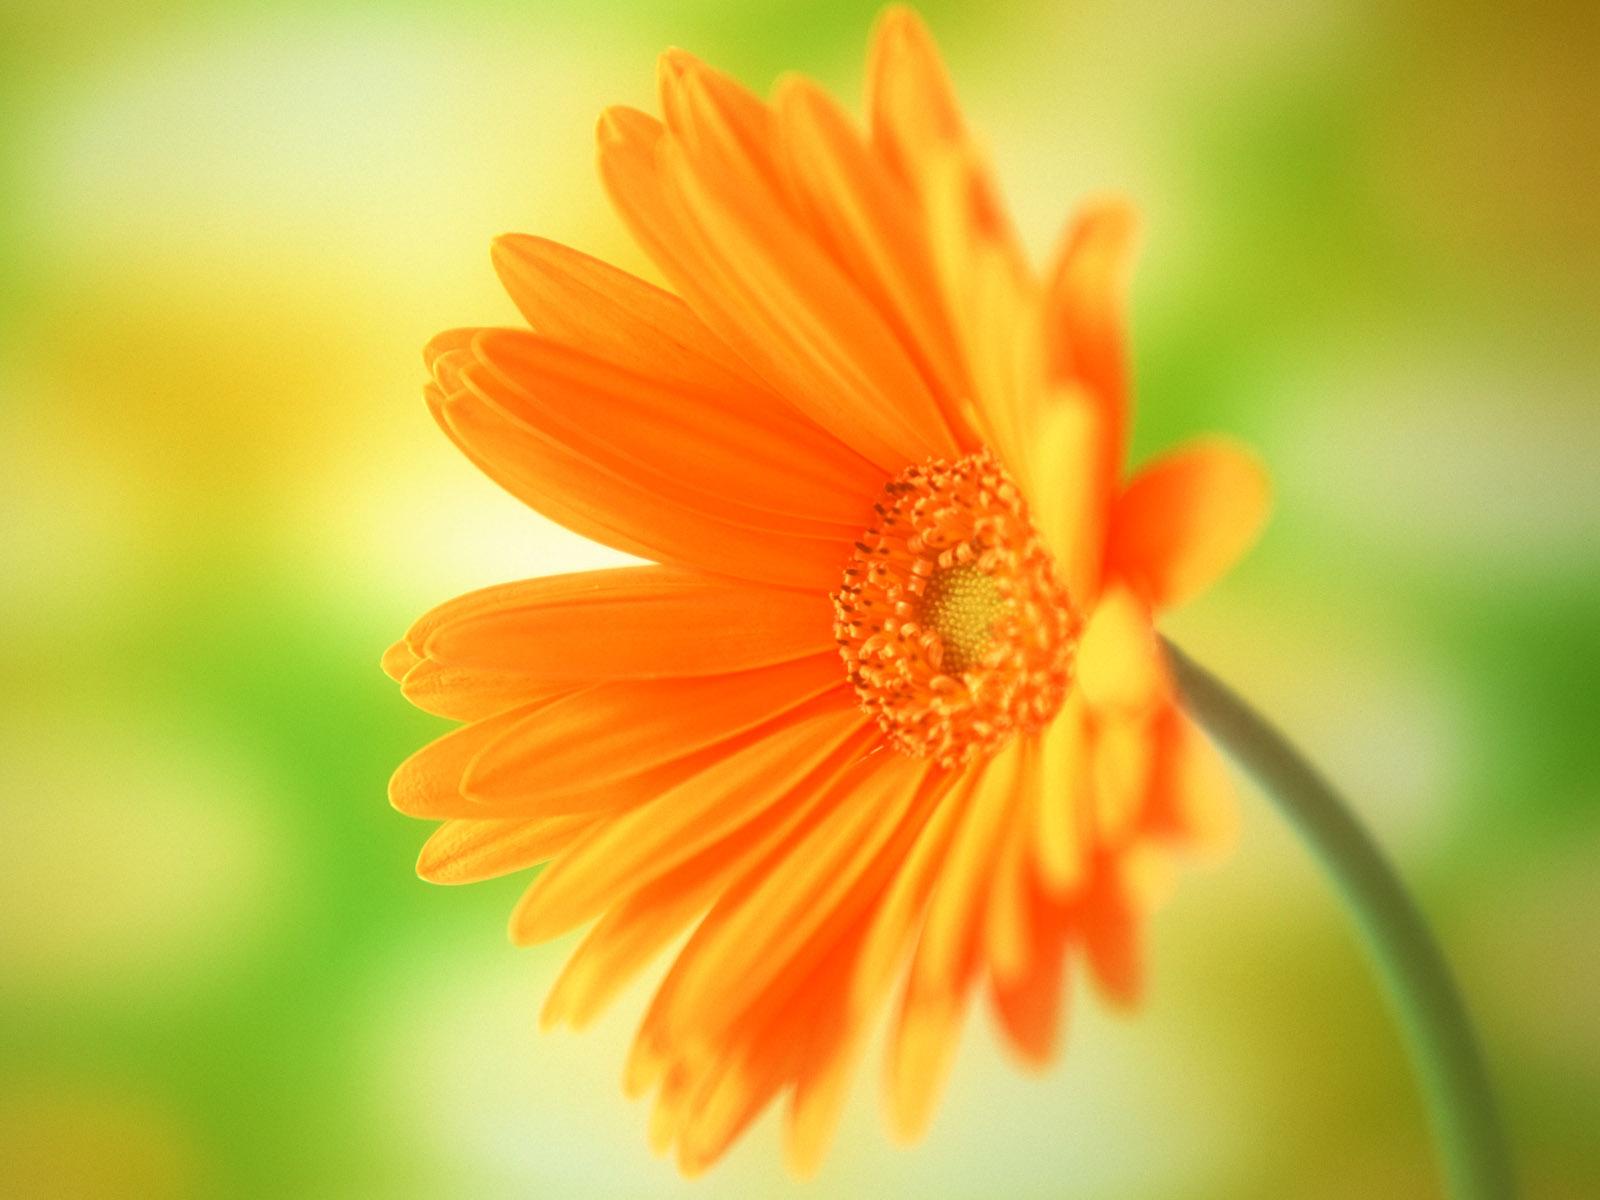 50+ Mesmerizing Flower Wallpaper ideas: Explore your Love for Flower